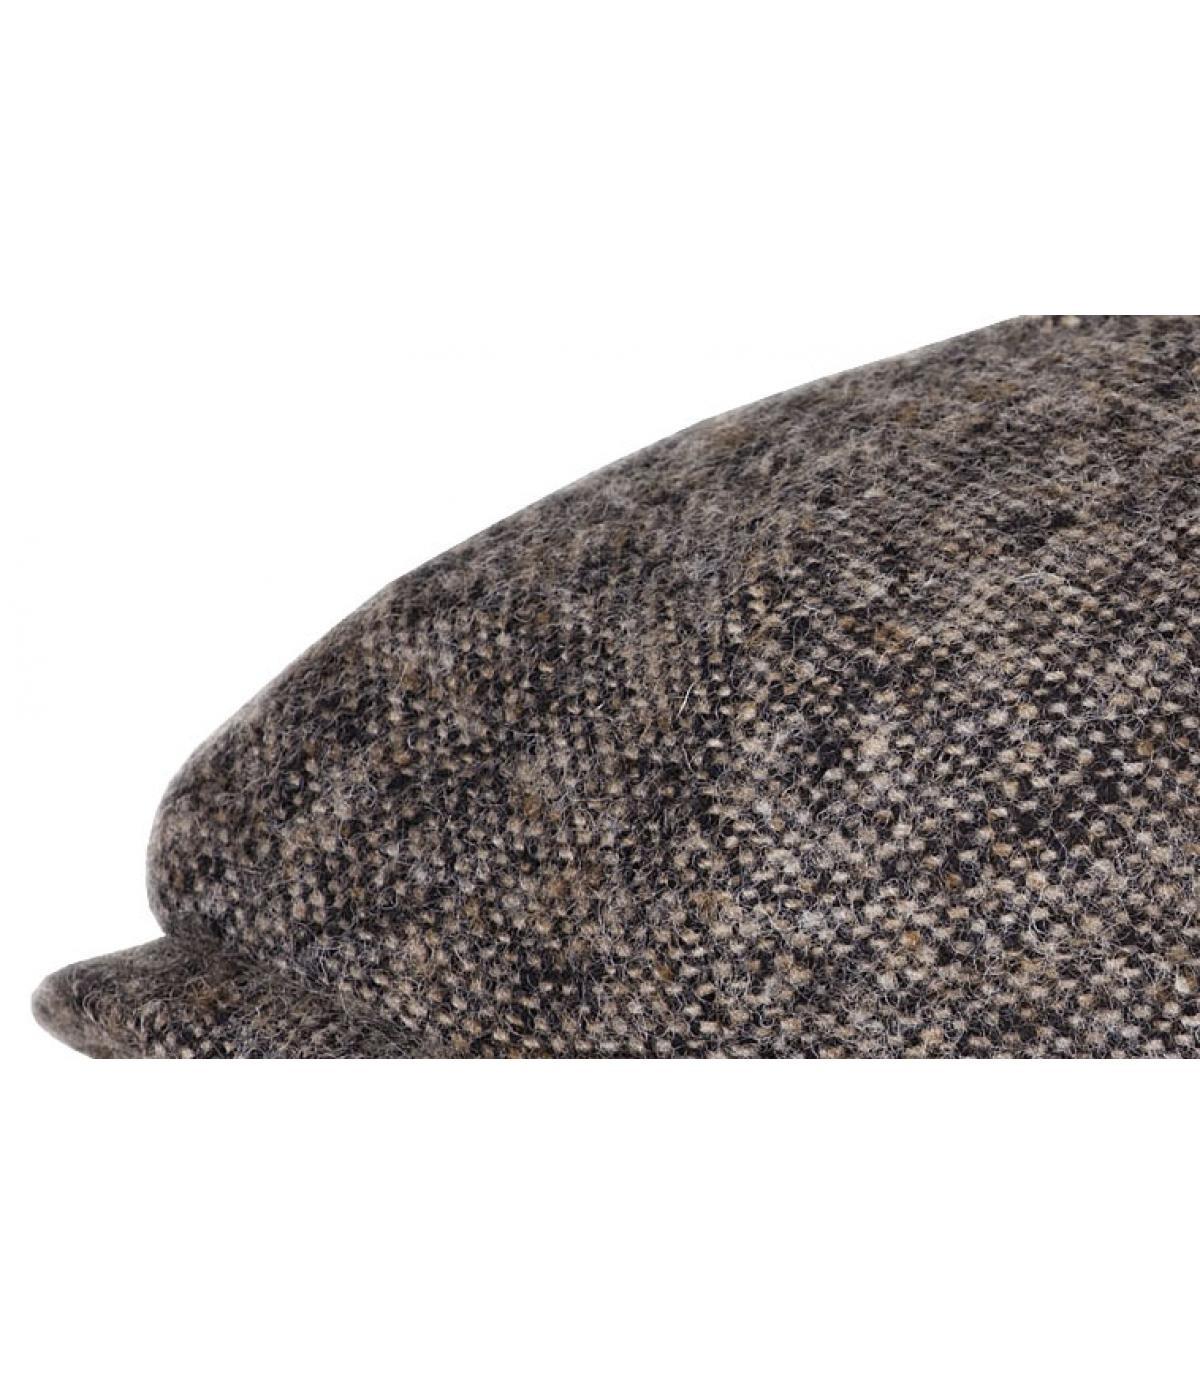 Casquette laine brute